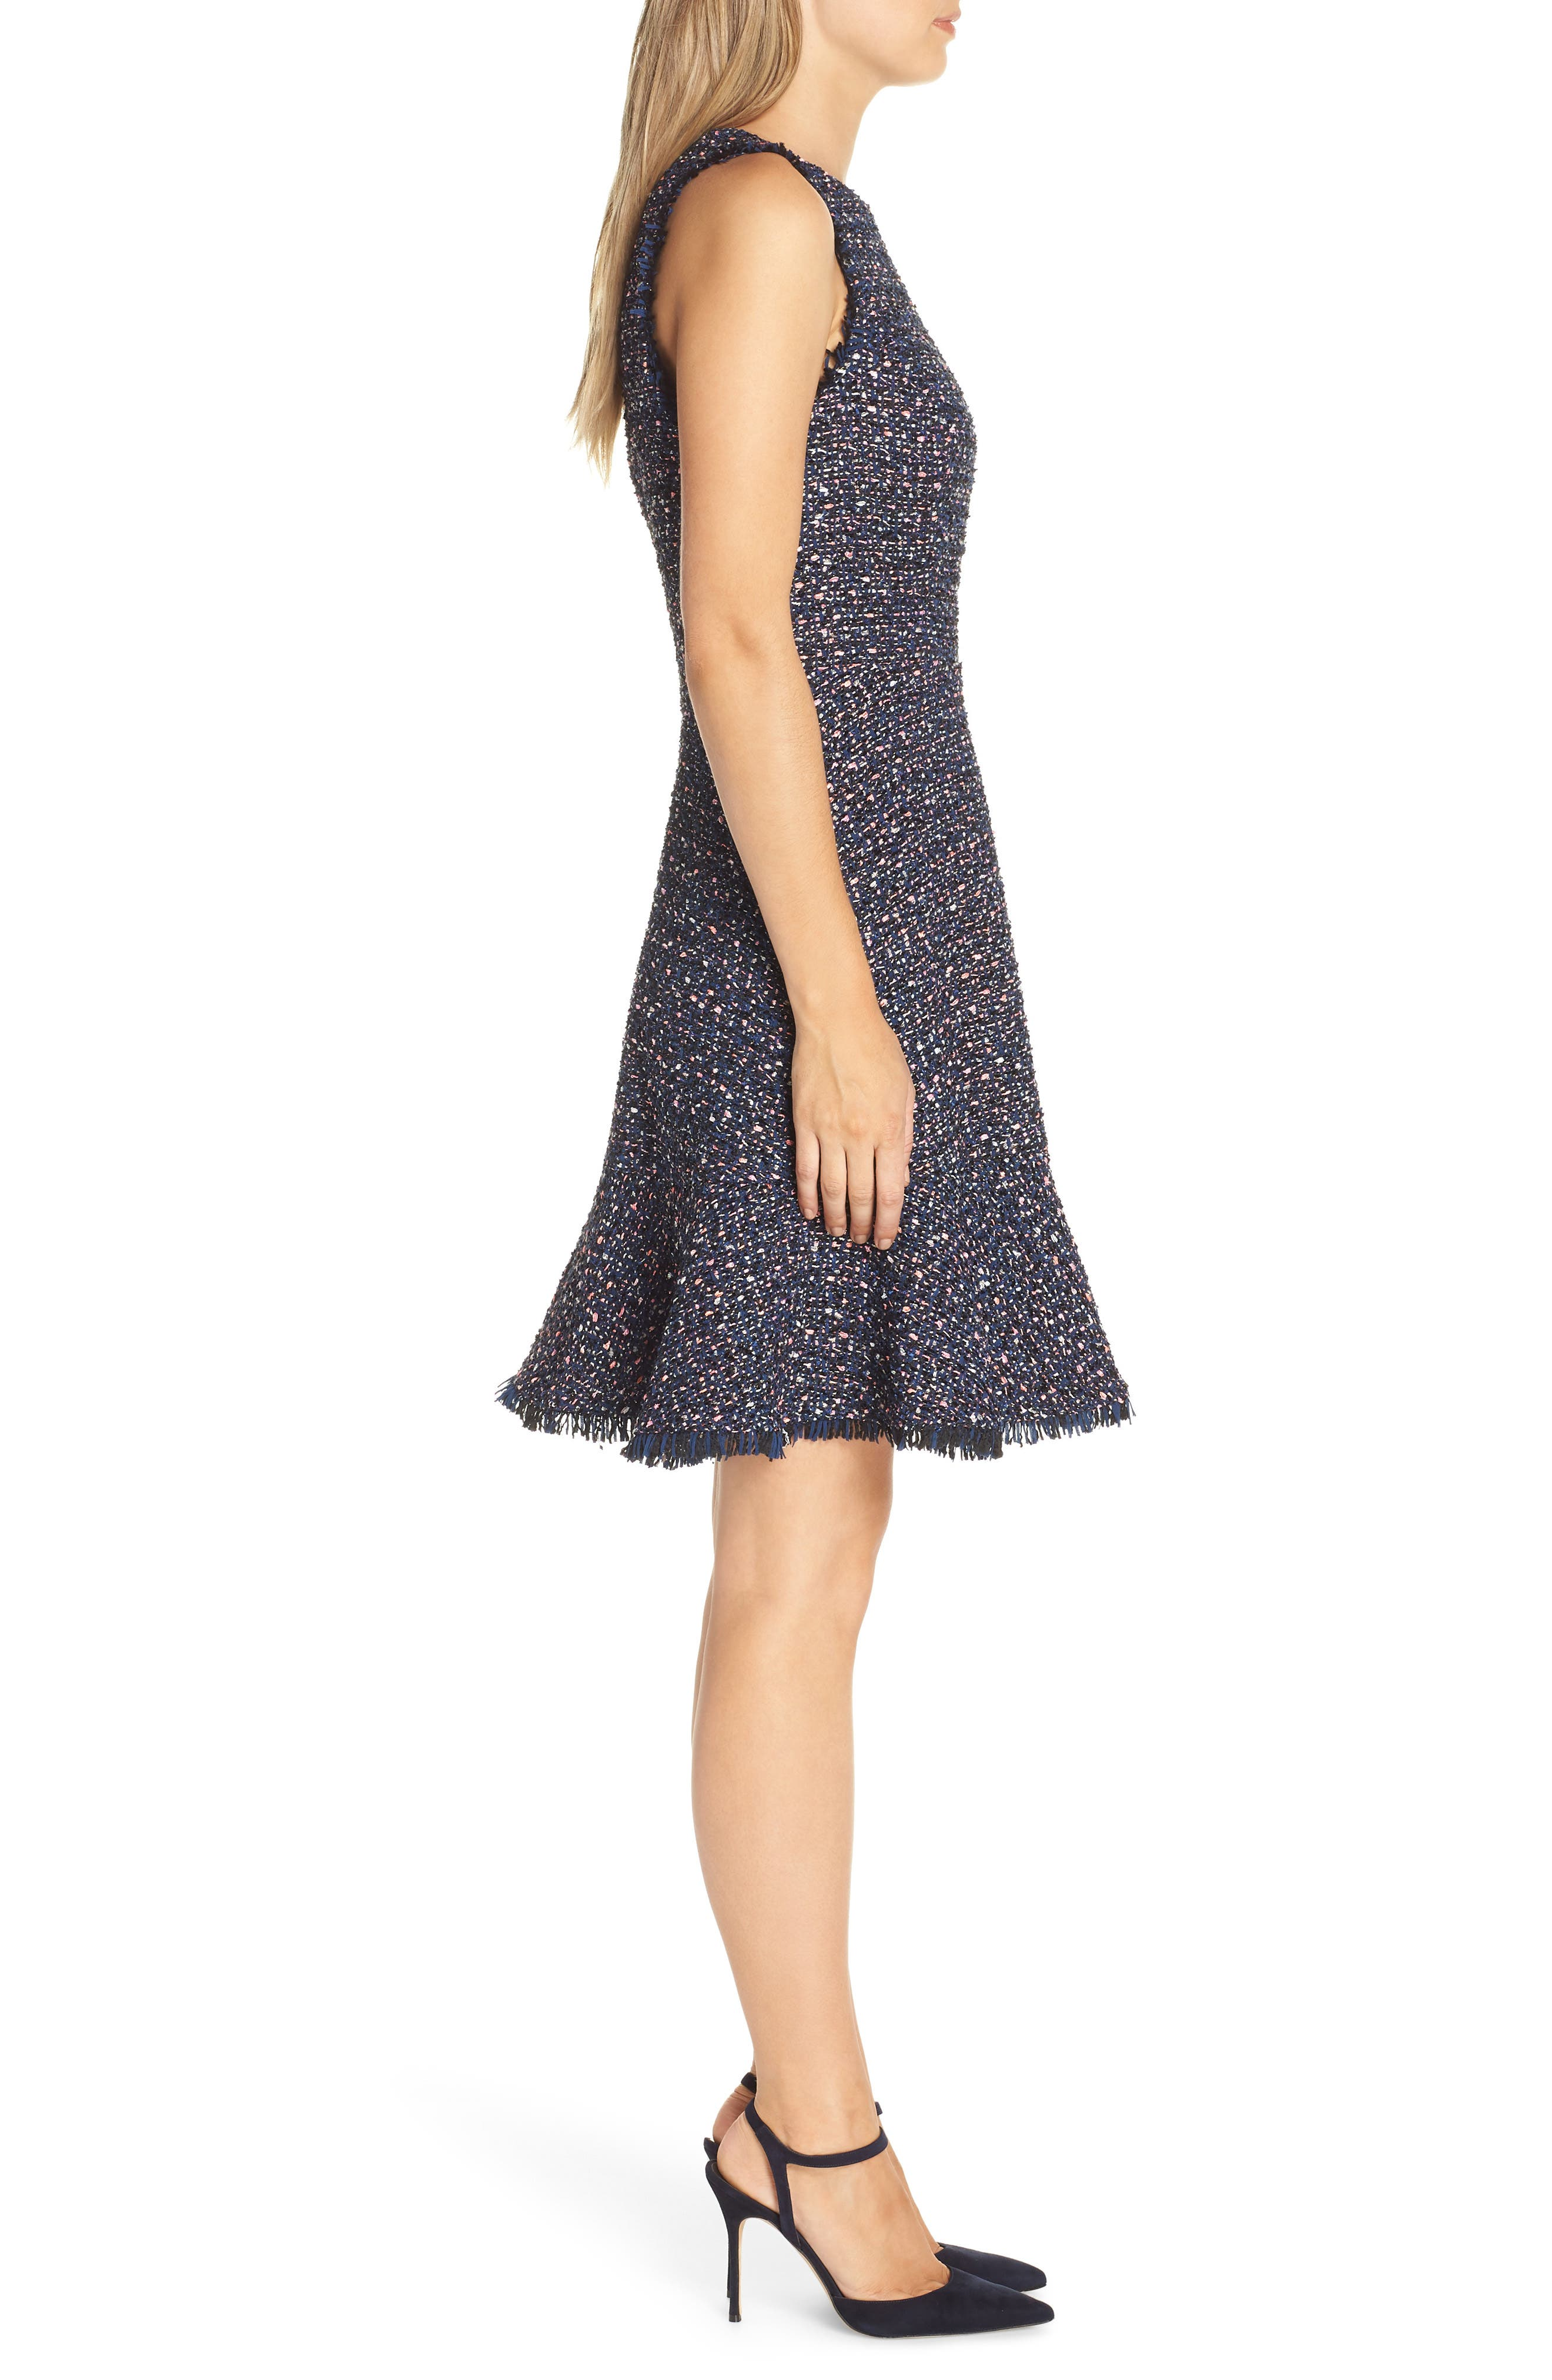 ELIZA J, Sleeveless Tweed Fit & Flare Dress, Alternate thumbnail 4, color, NAVY